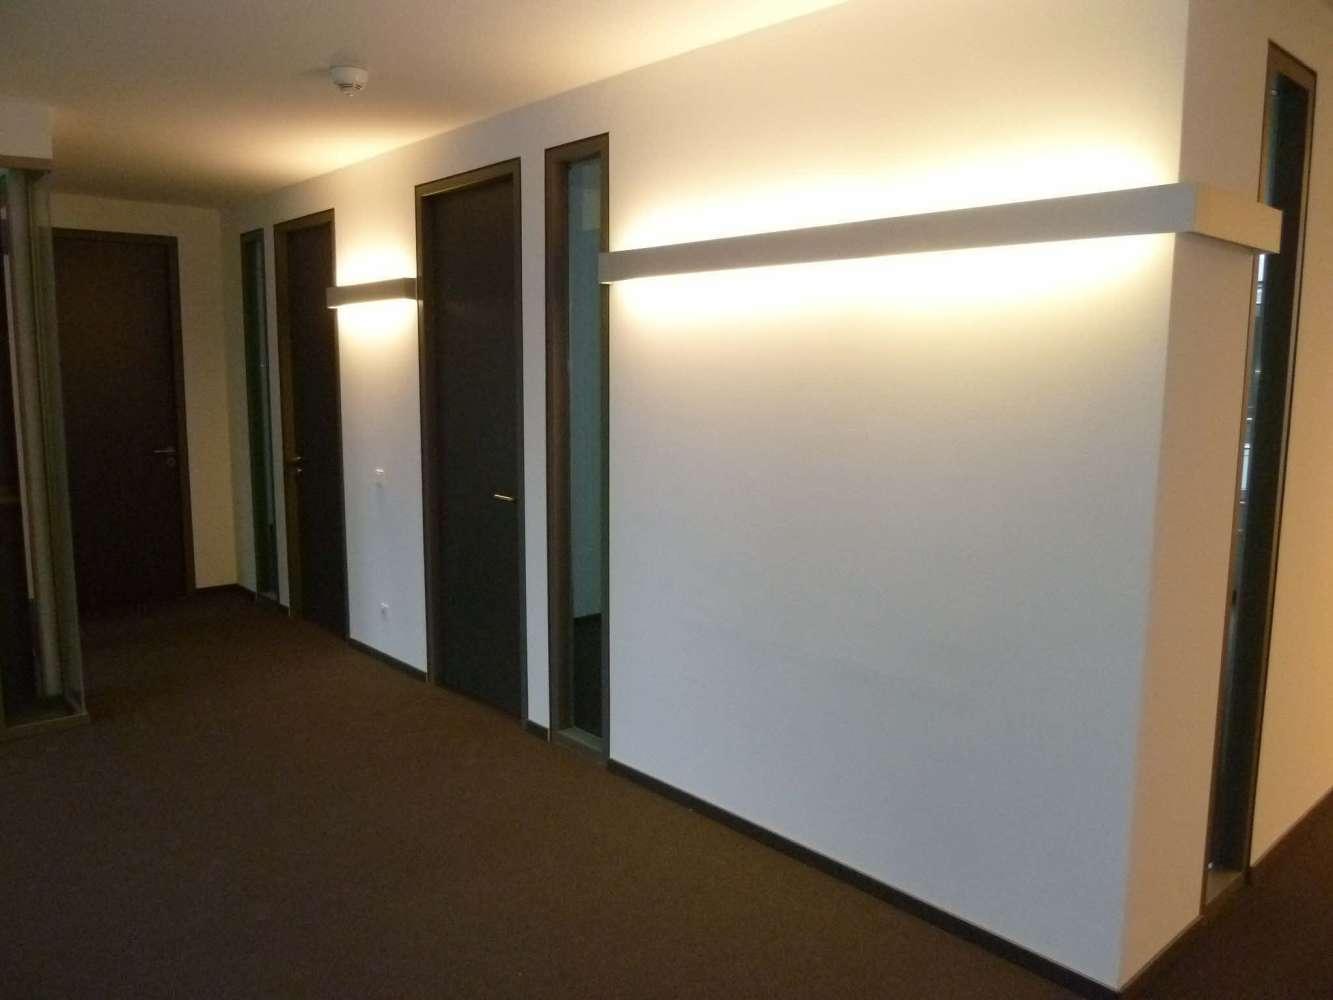 Büros Hamburg, 20457 - Büro - Hamburg, Altstadt - H1039 - 9409485